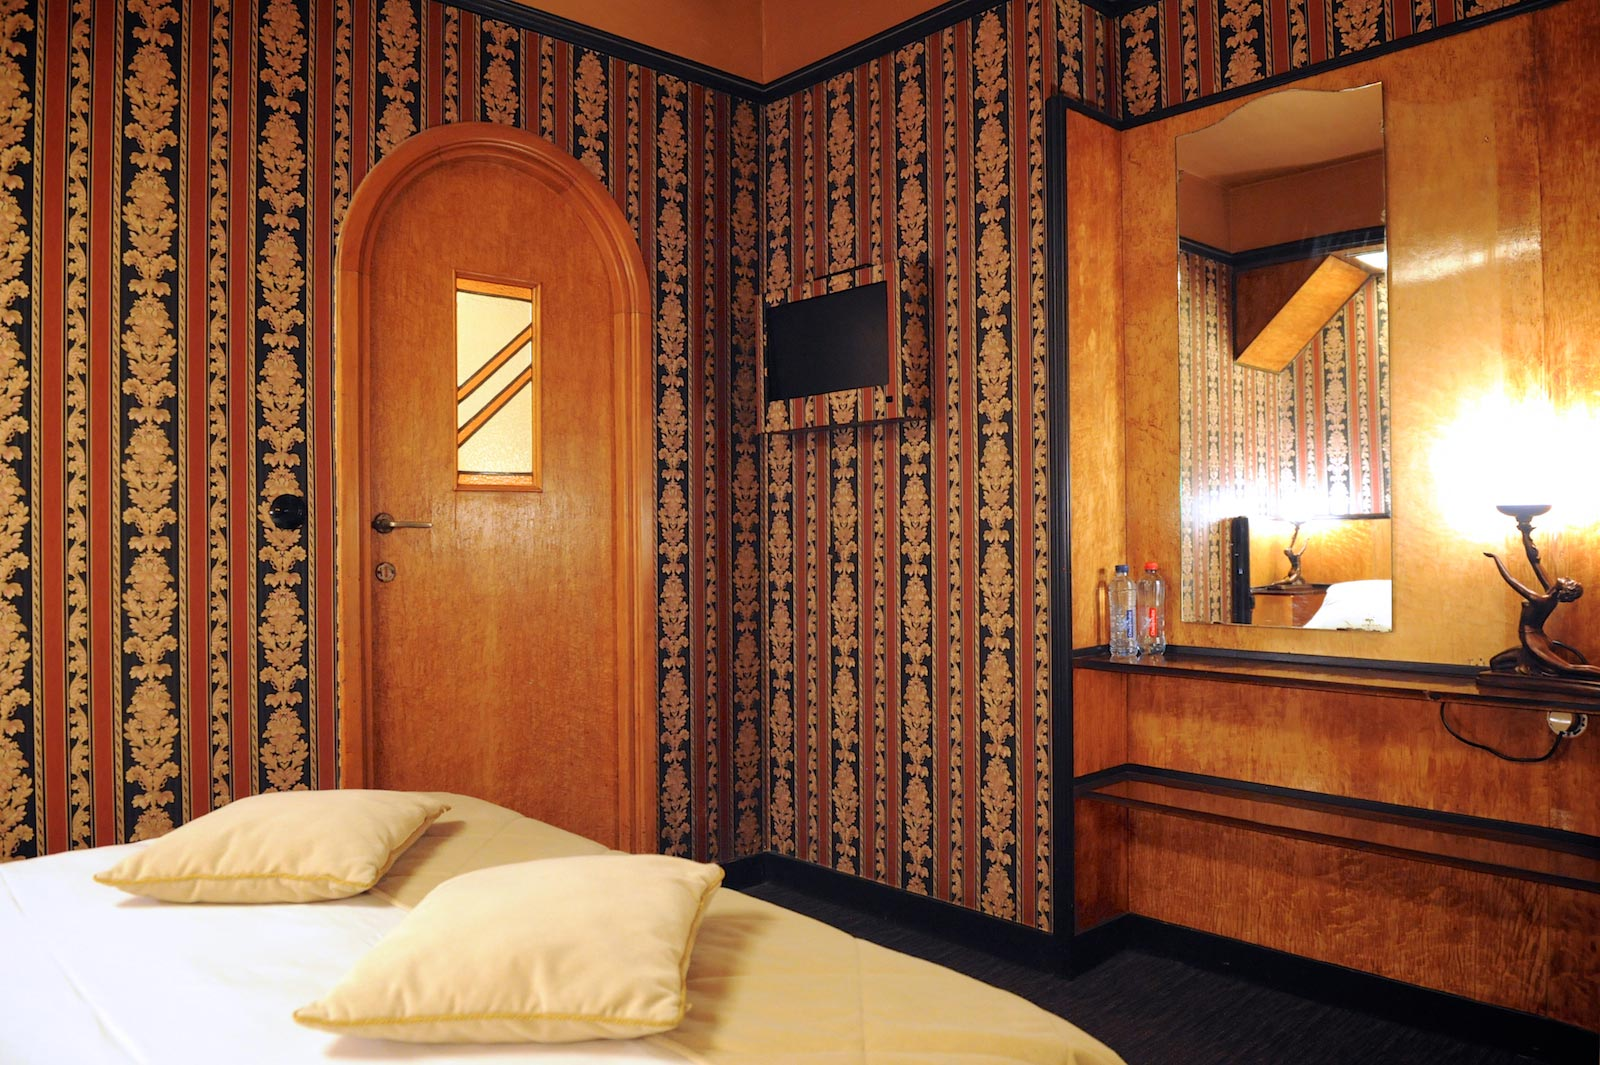 hotel-le-berger-rooms-superieur-antoinette-07-12.jpg